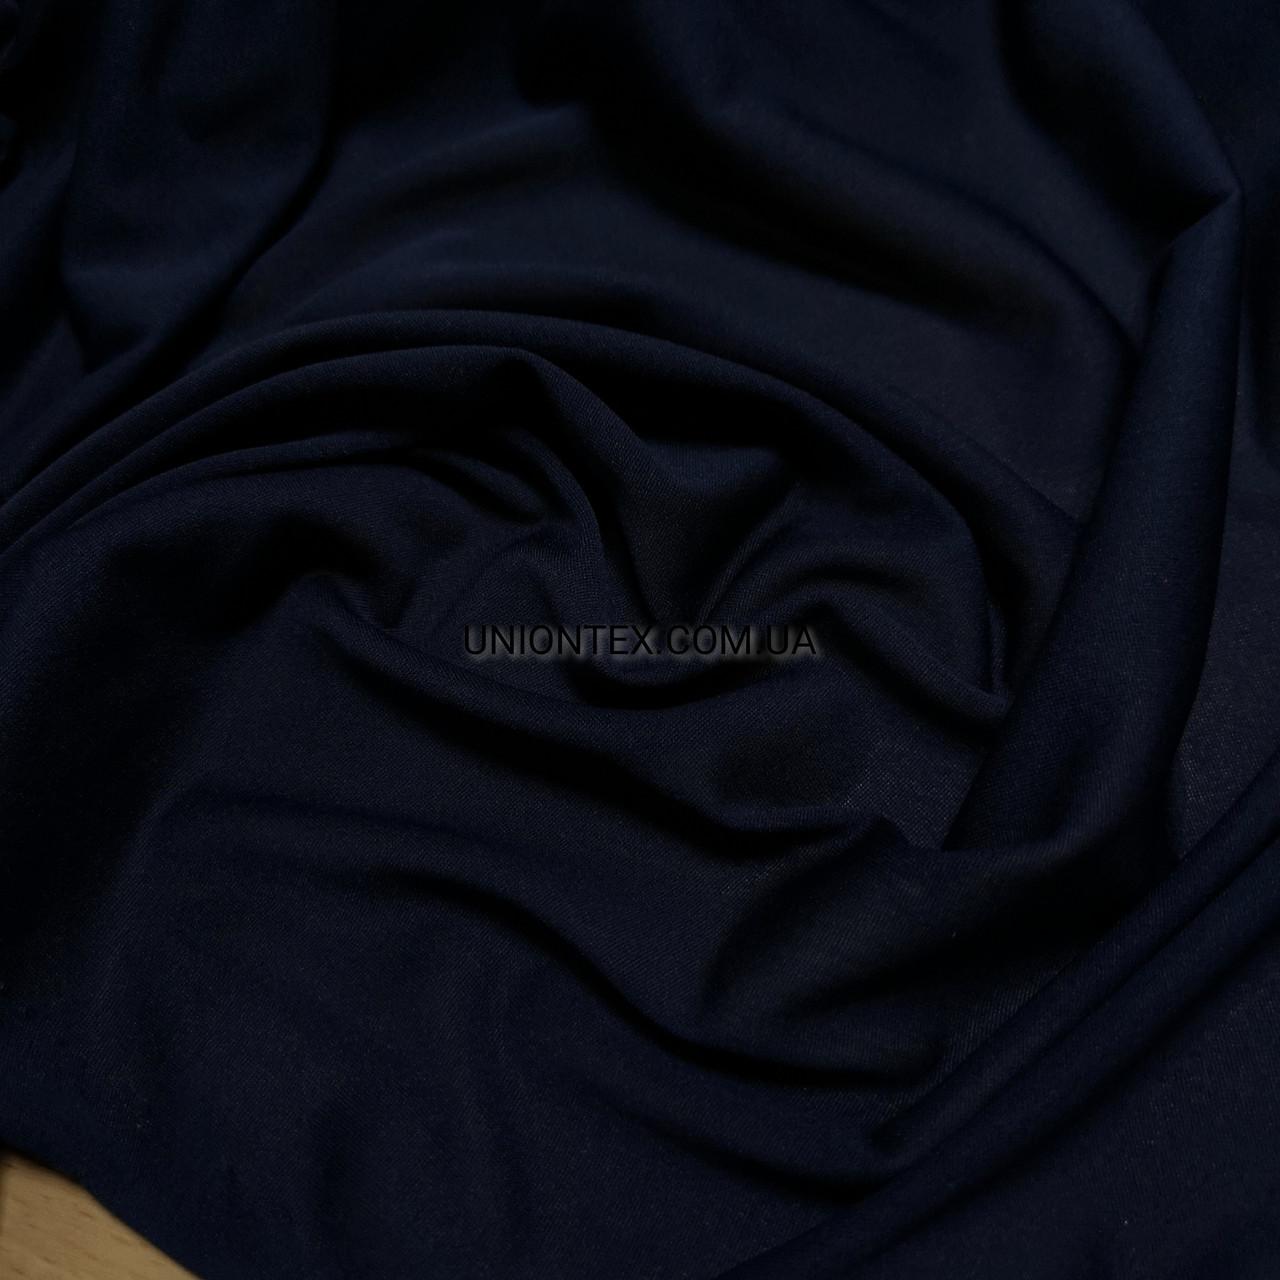 Подкладка трикотажная темно-синяя